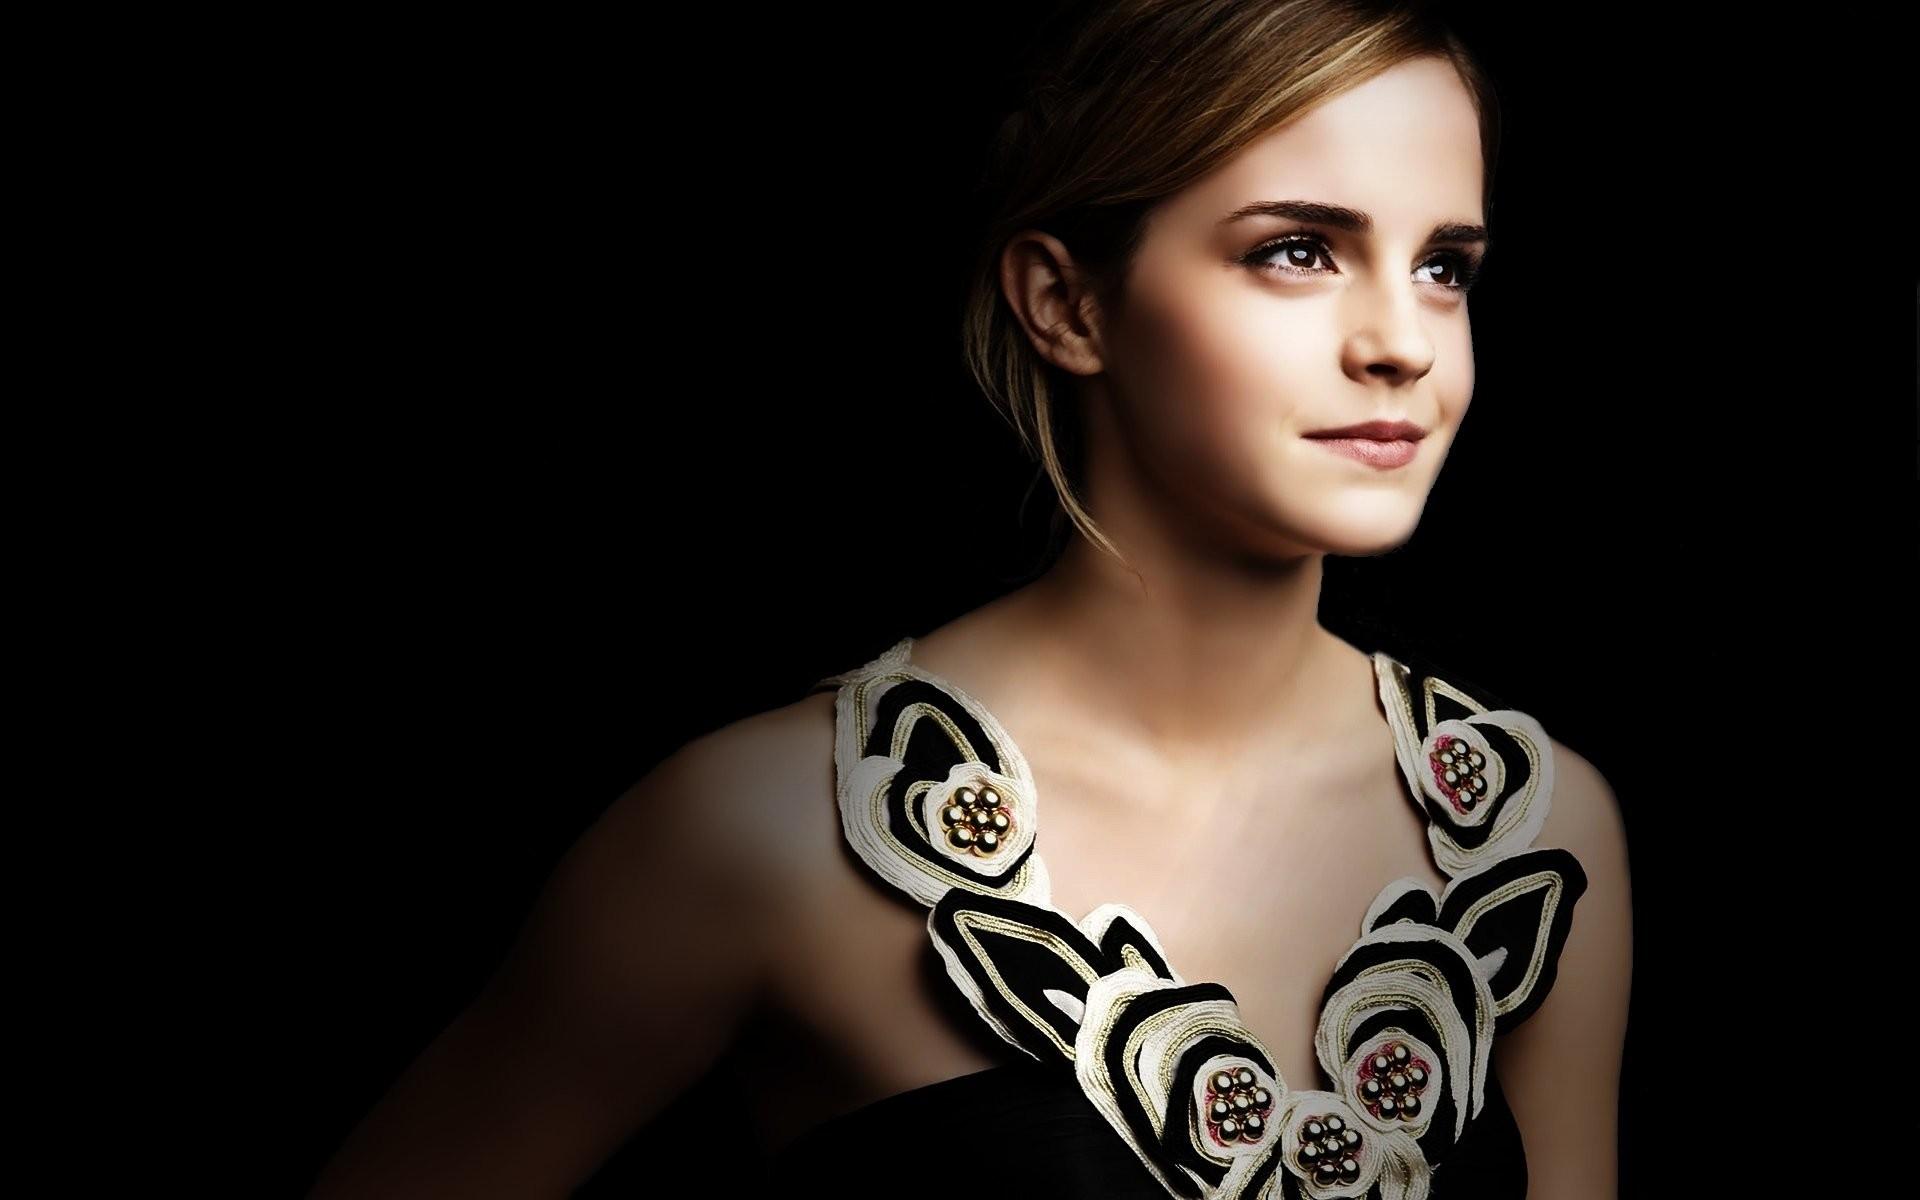 Emma Watson - Emma Watson , HD Wallpaper & Backgrounds